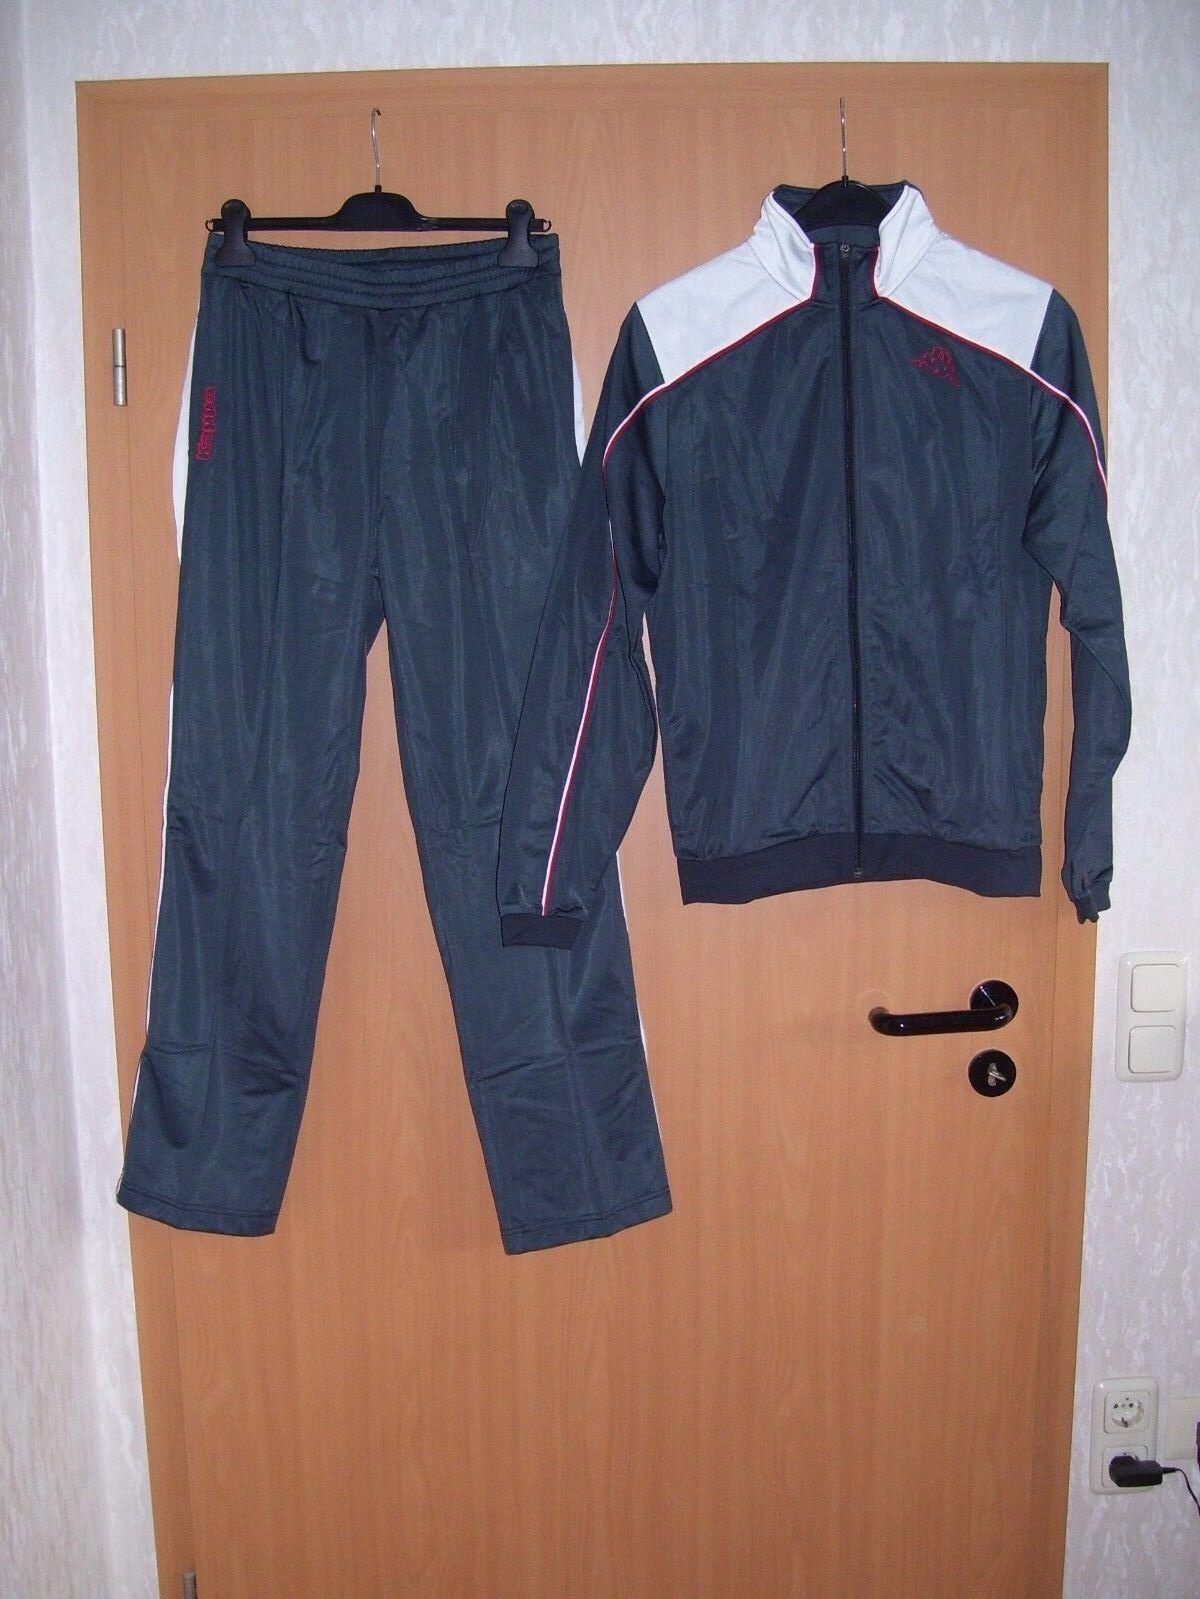 Kappa Trainingsanzug Herren Jogginganzug Jacke und Hose Sportanzug grau S XL neu